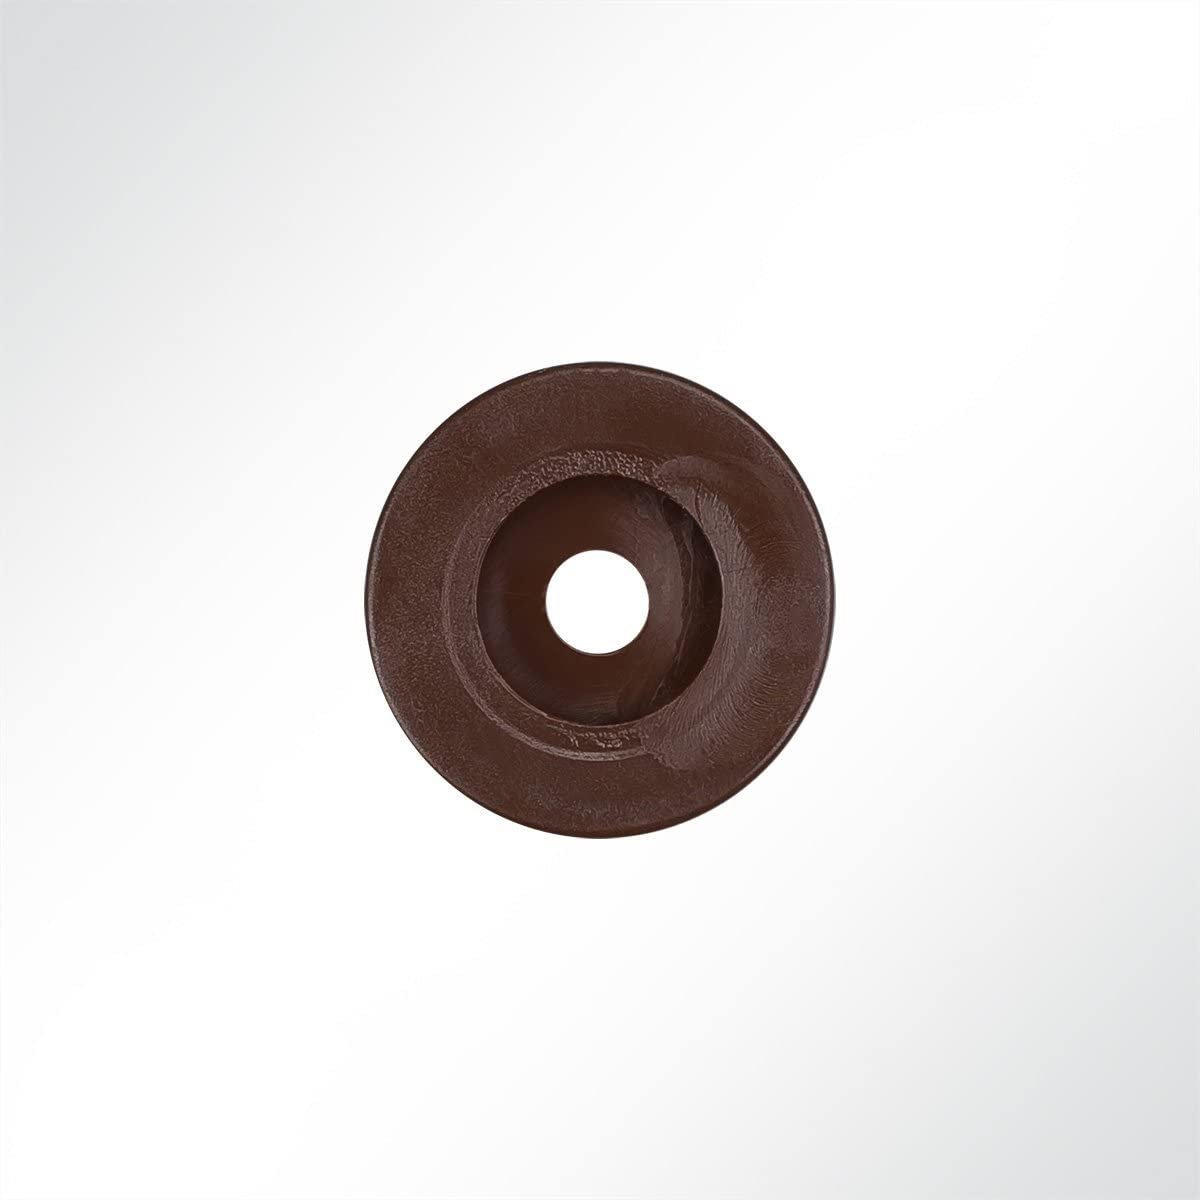 10 St/ück 25mm in Wei/ß D LYSEL Kunststoff Rundknopf,